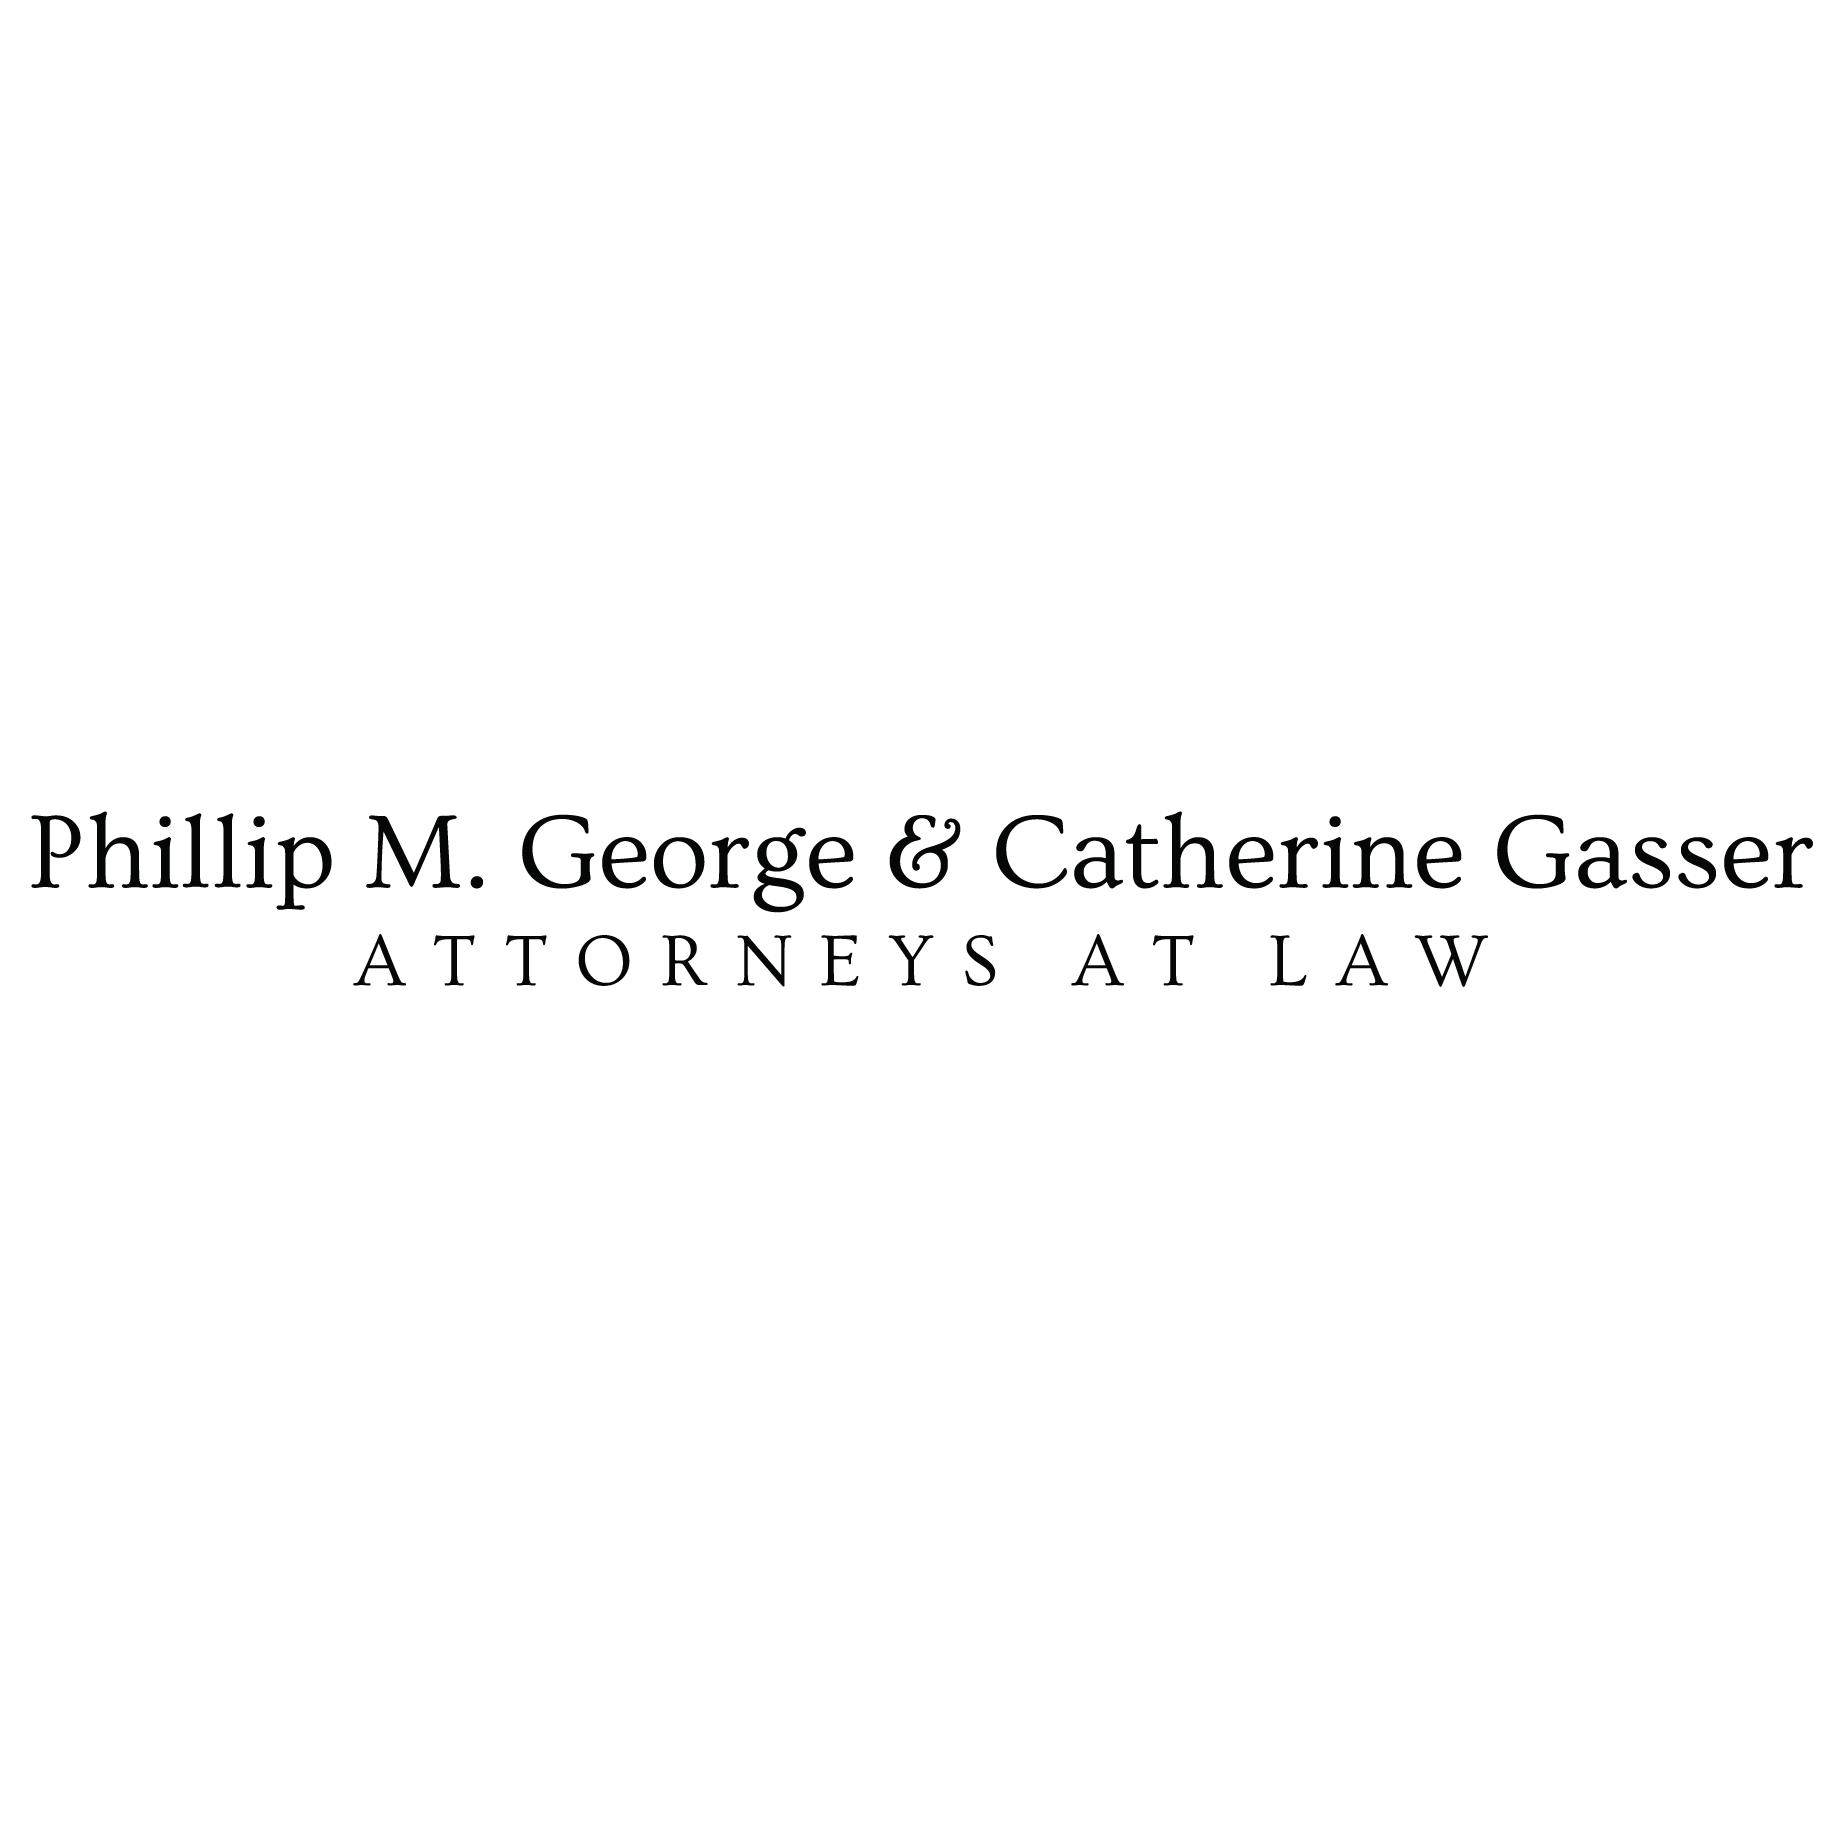 Phillip M. George & Catherine Gasser, Attorneys at Law